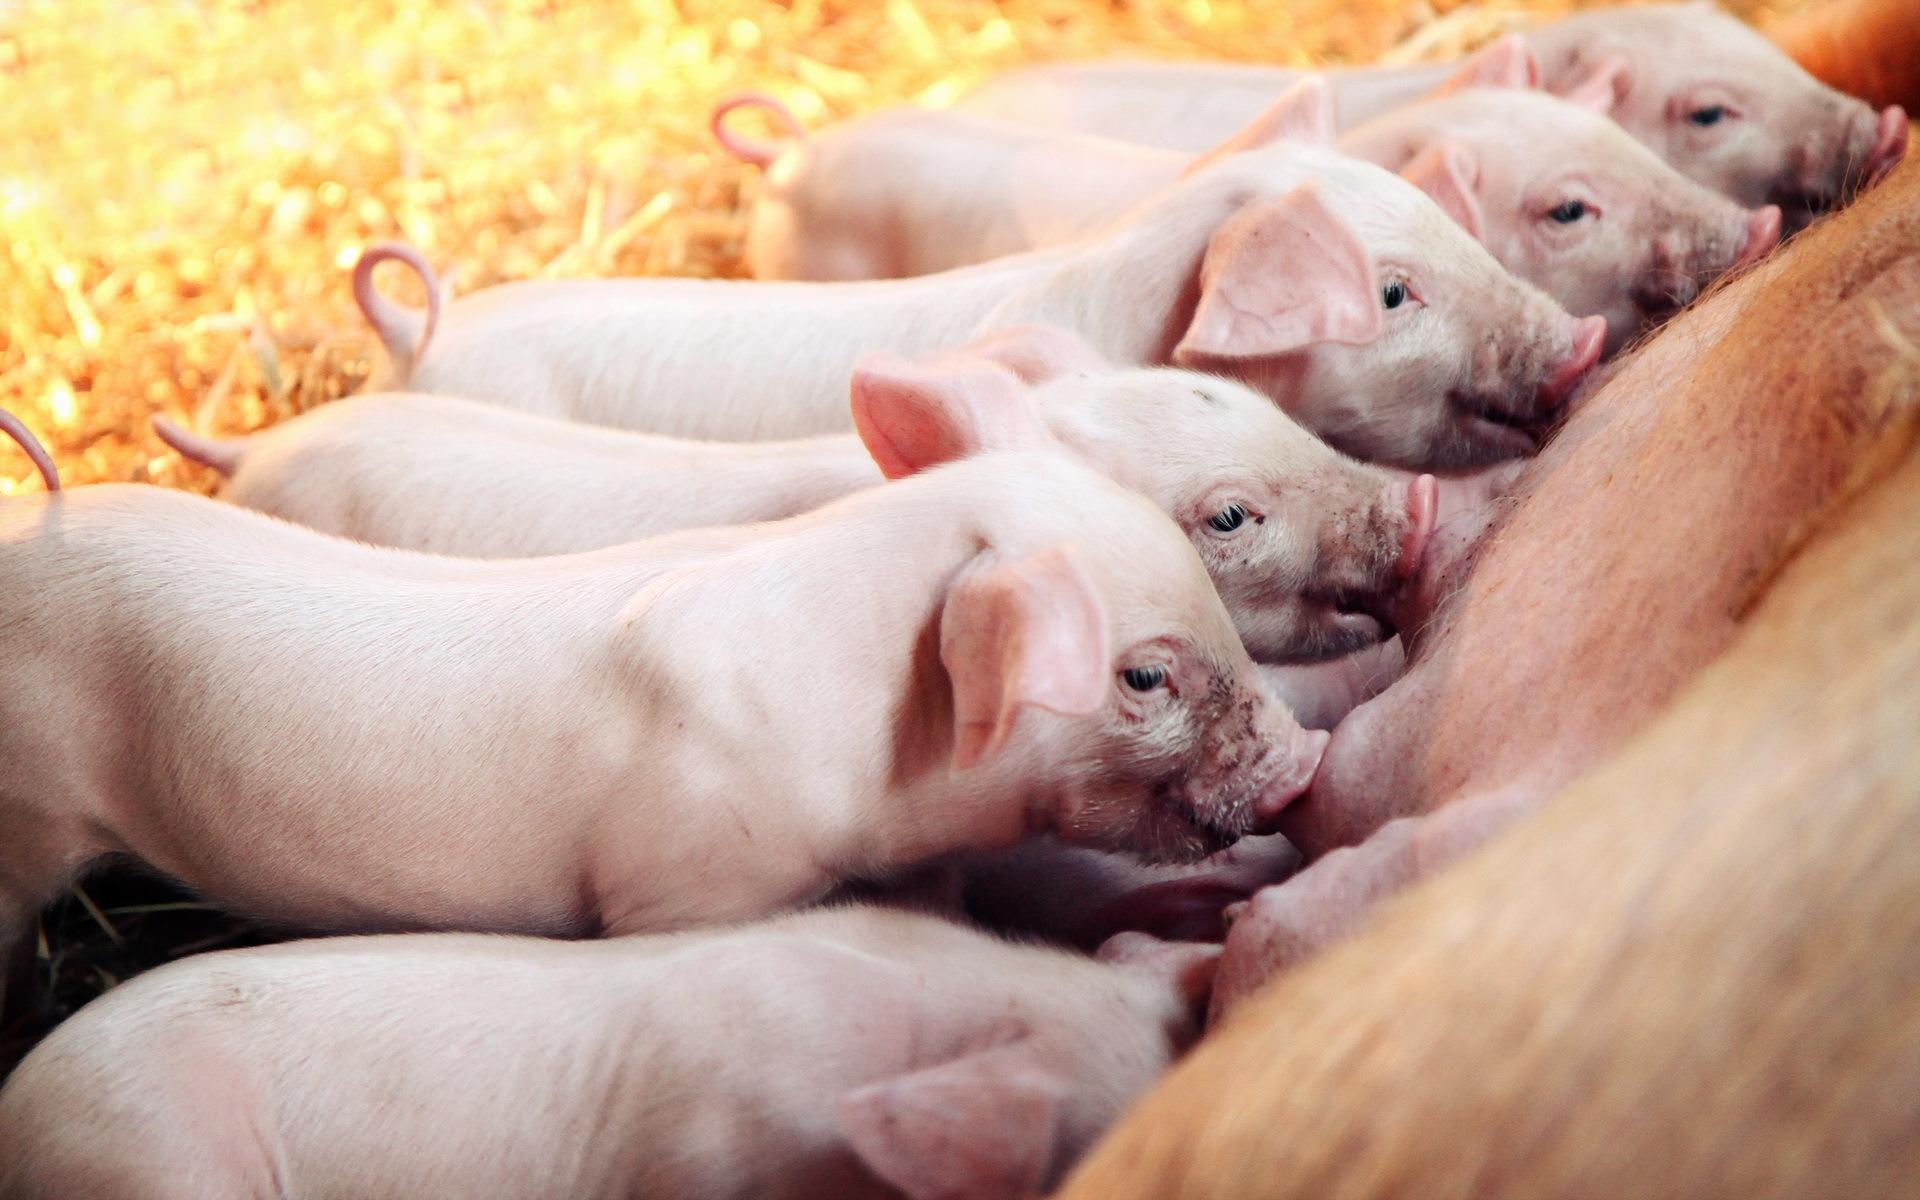 Pig Desktop Wallpaper Animal   pig wallpaper 1920x1200